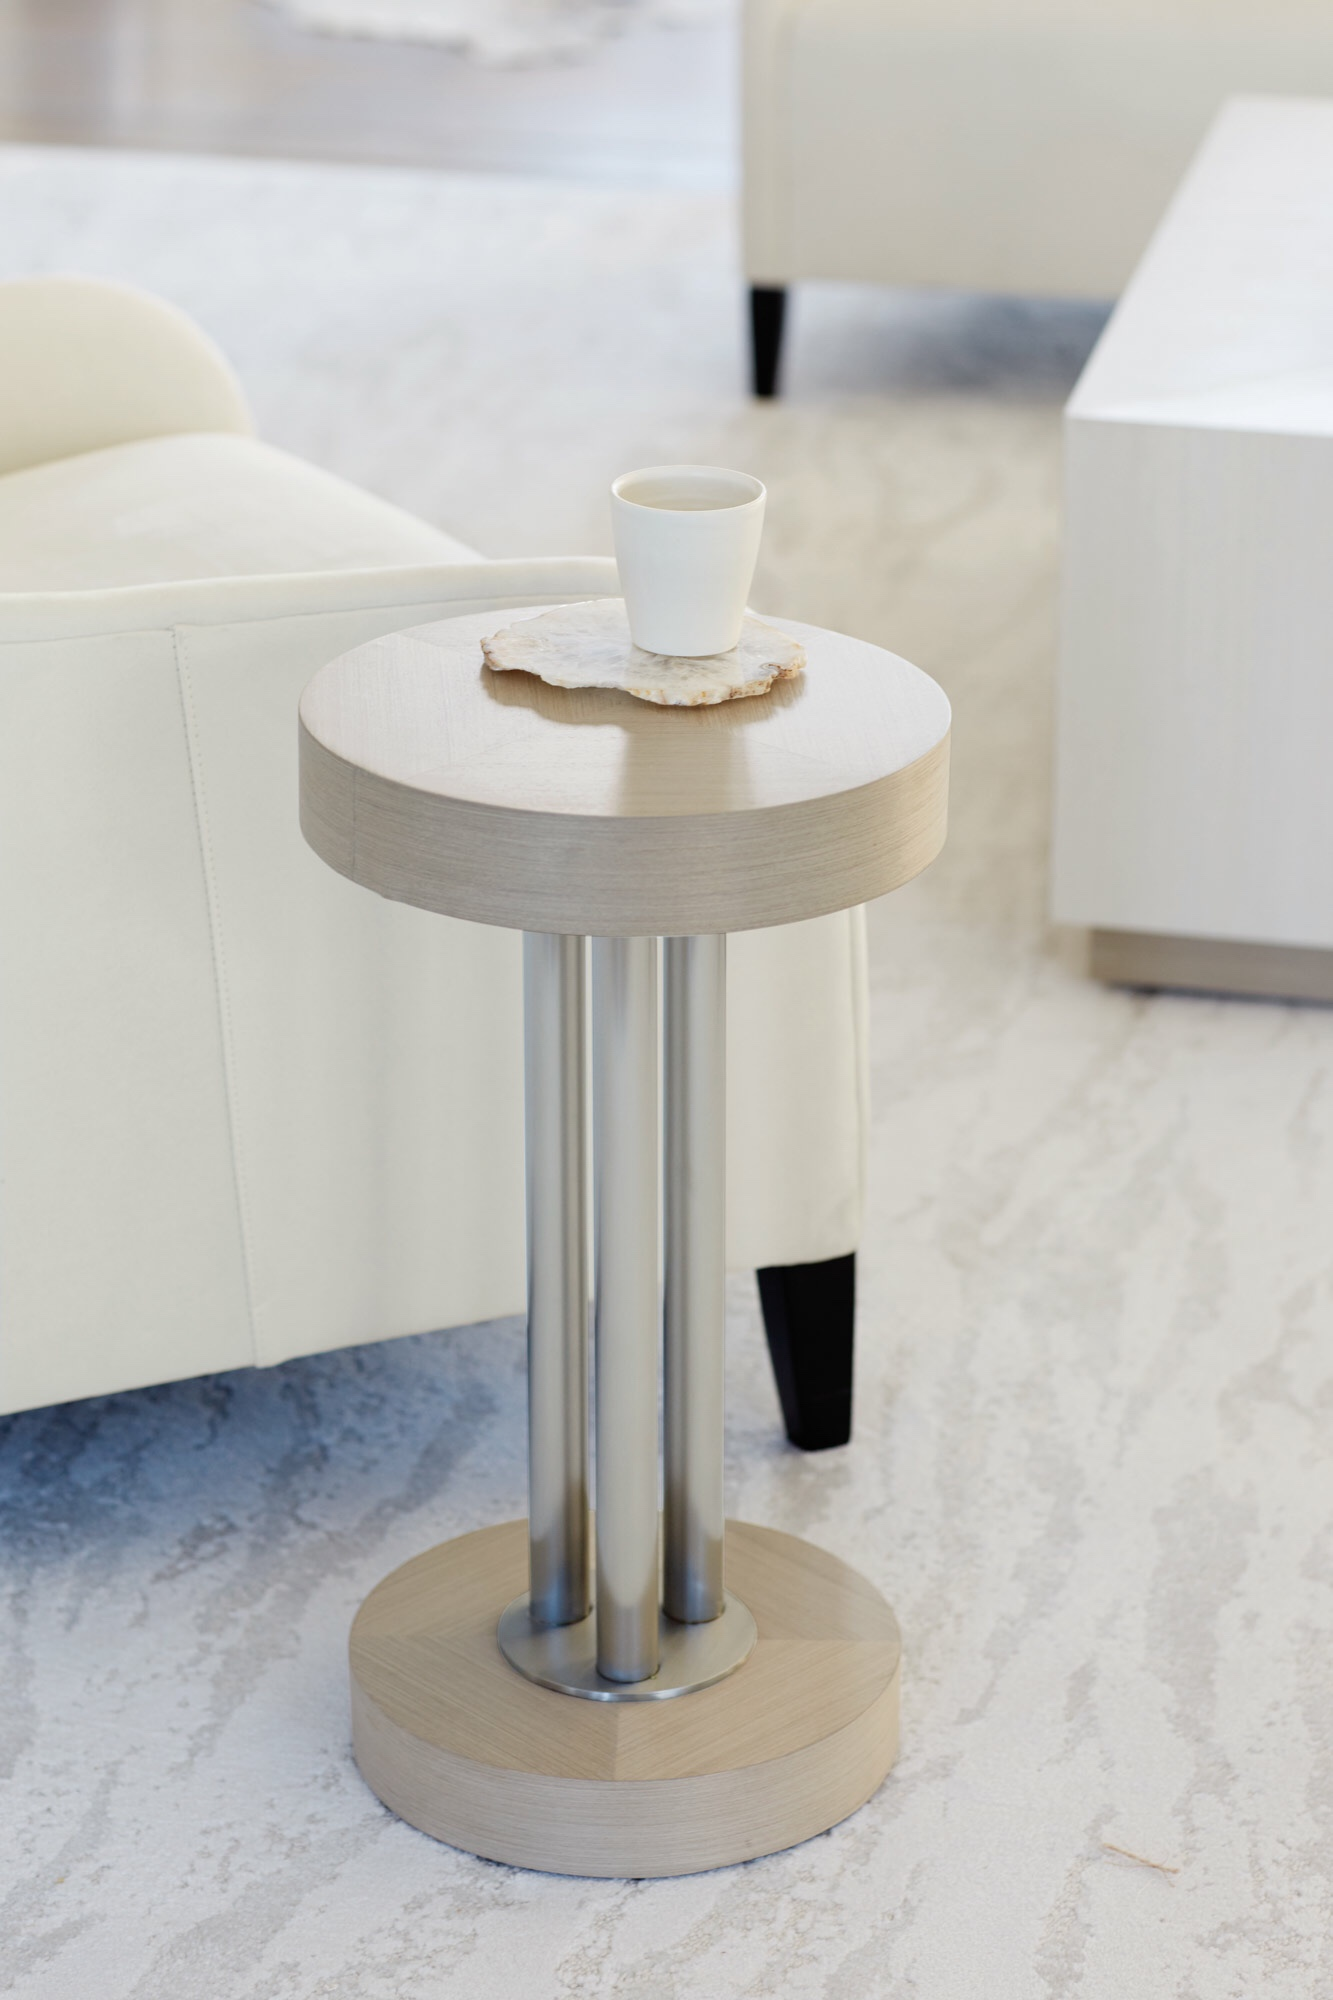 Bernhardt Furnture Axiom Round Chair Side Table